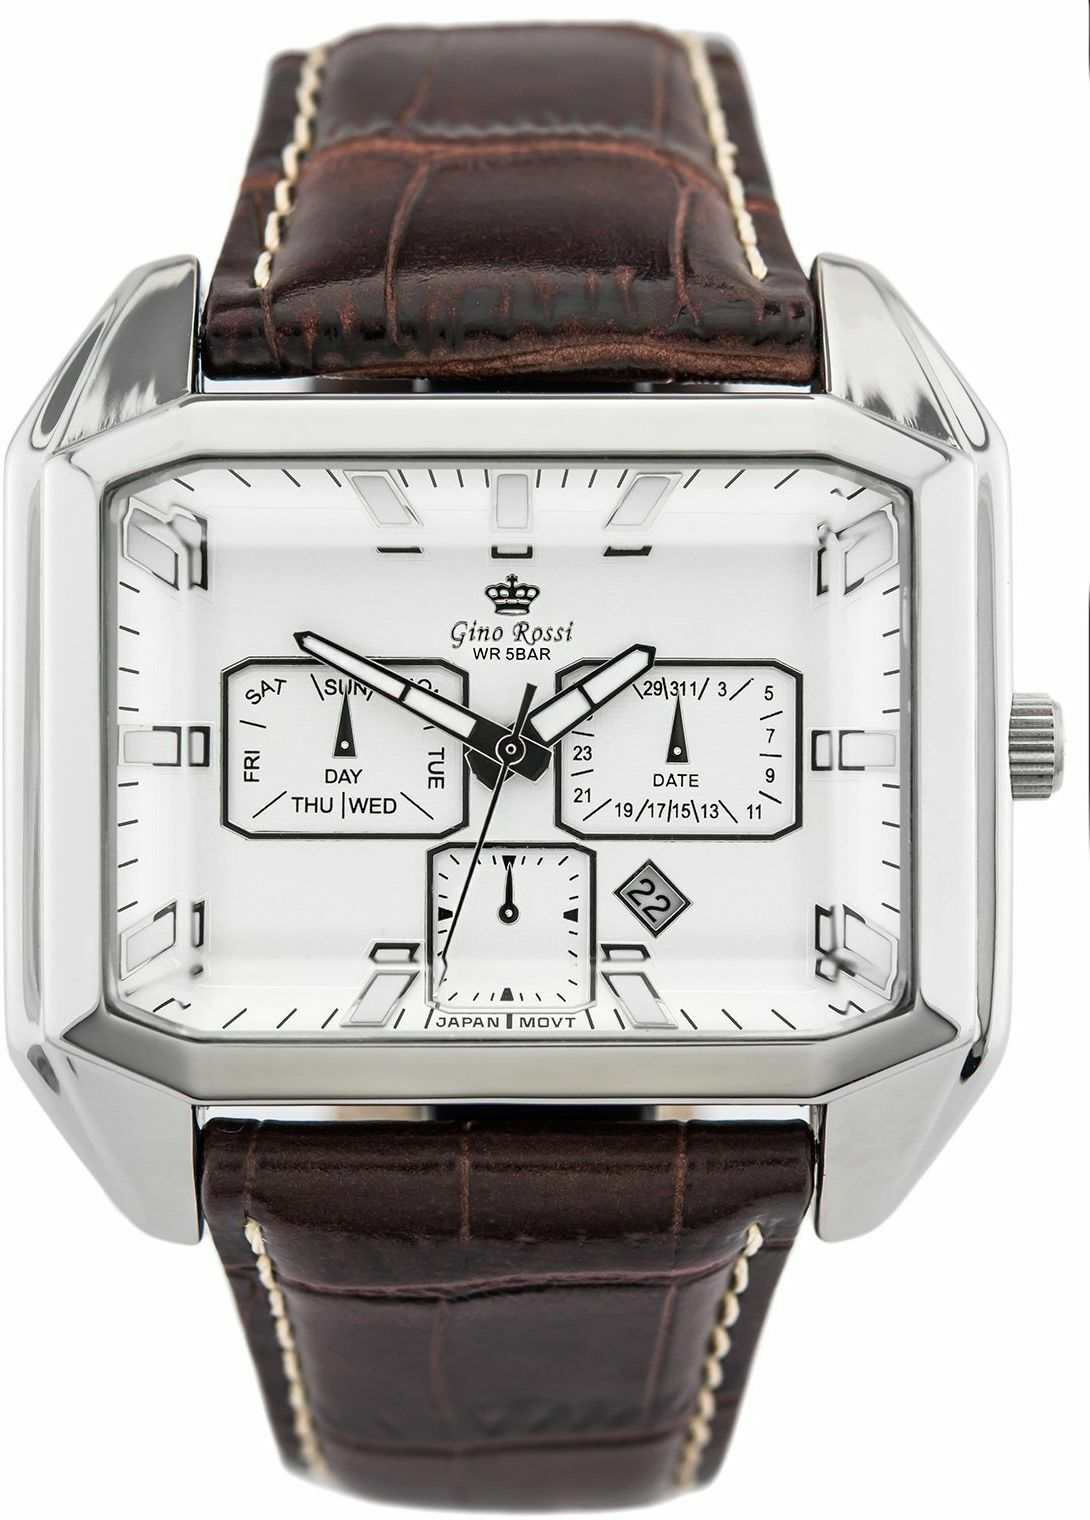 Gino Rossi zegarki